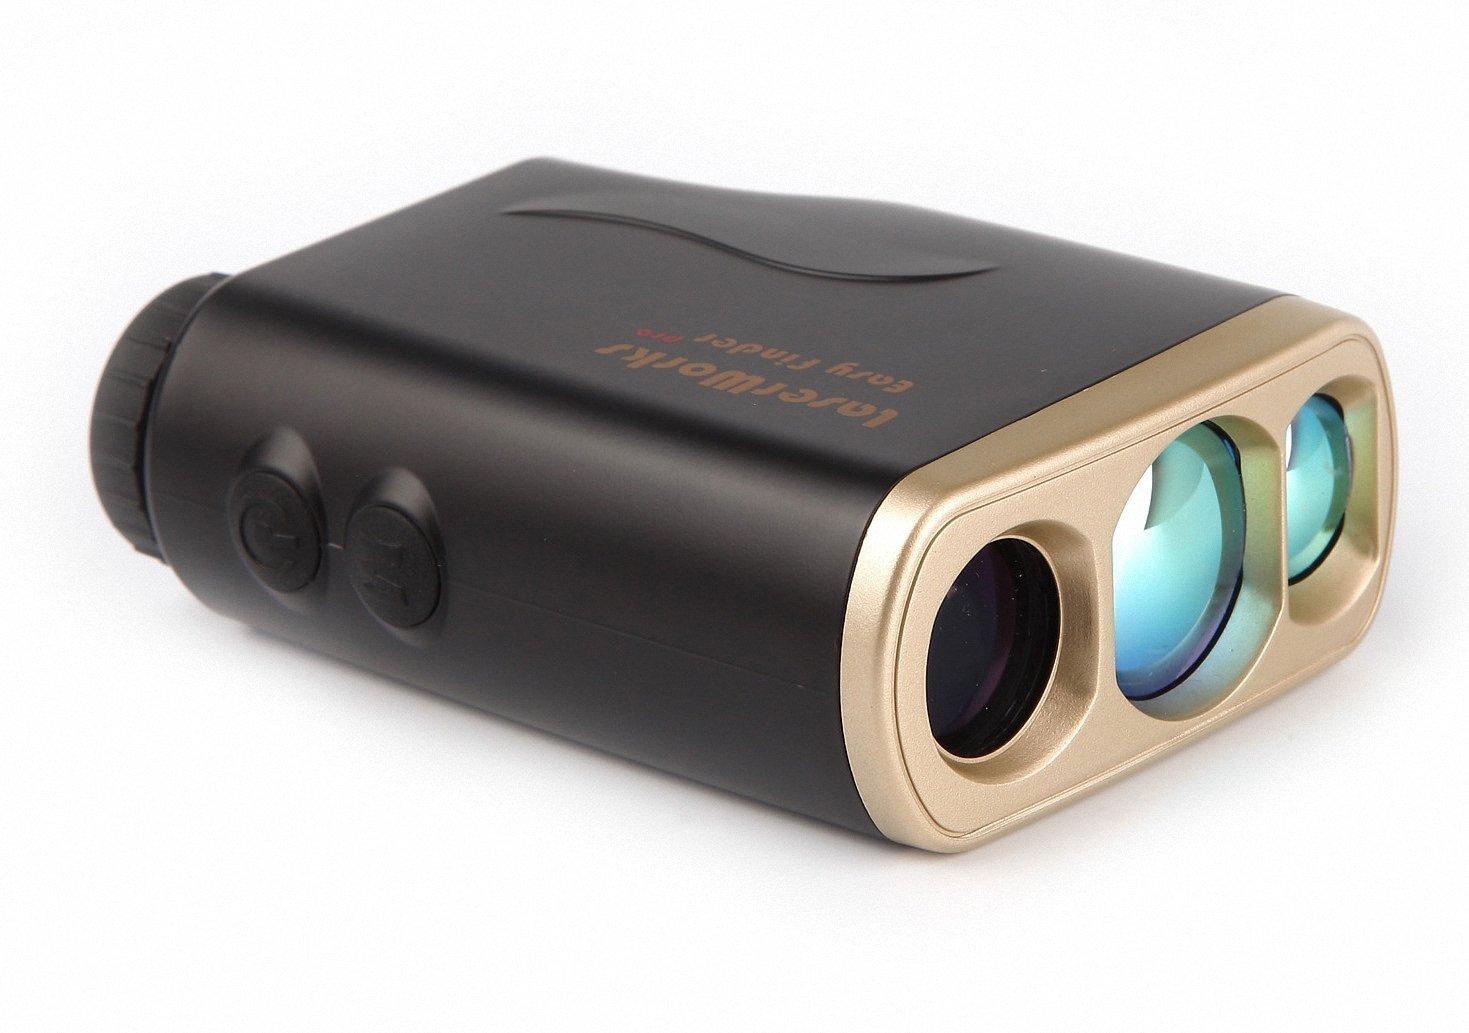 Laser Entfernungsmesser Nikon Aculon Al11 : Laserworks entfernungsmesser lw1000pro laser